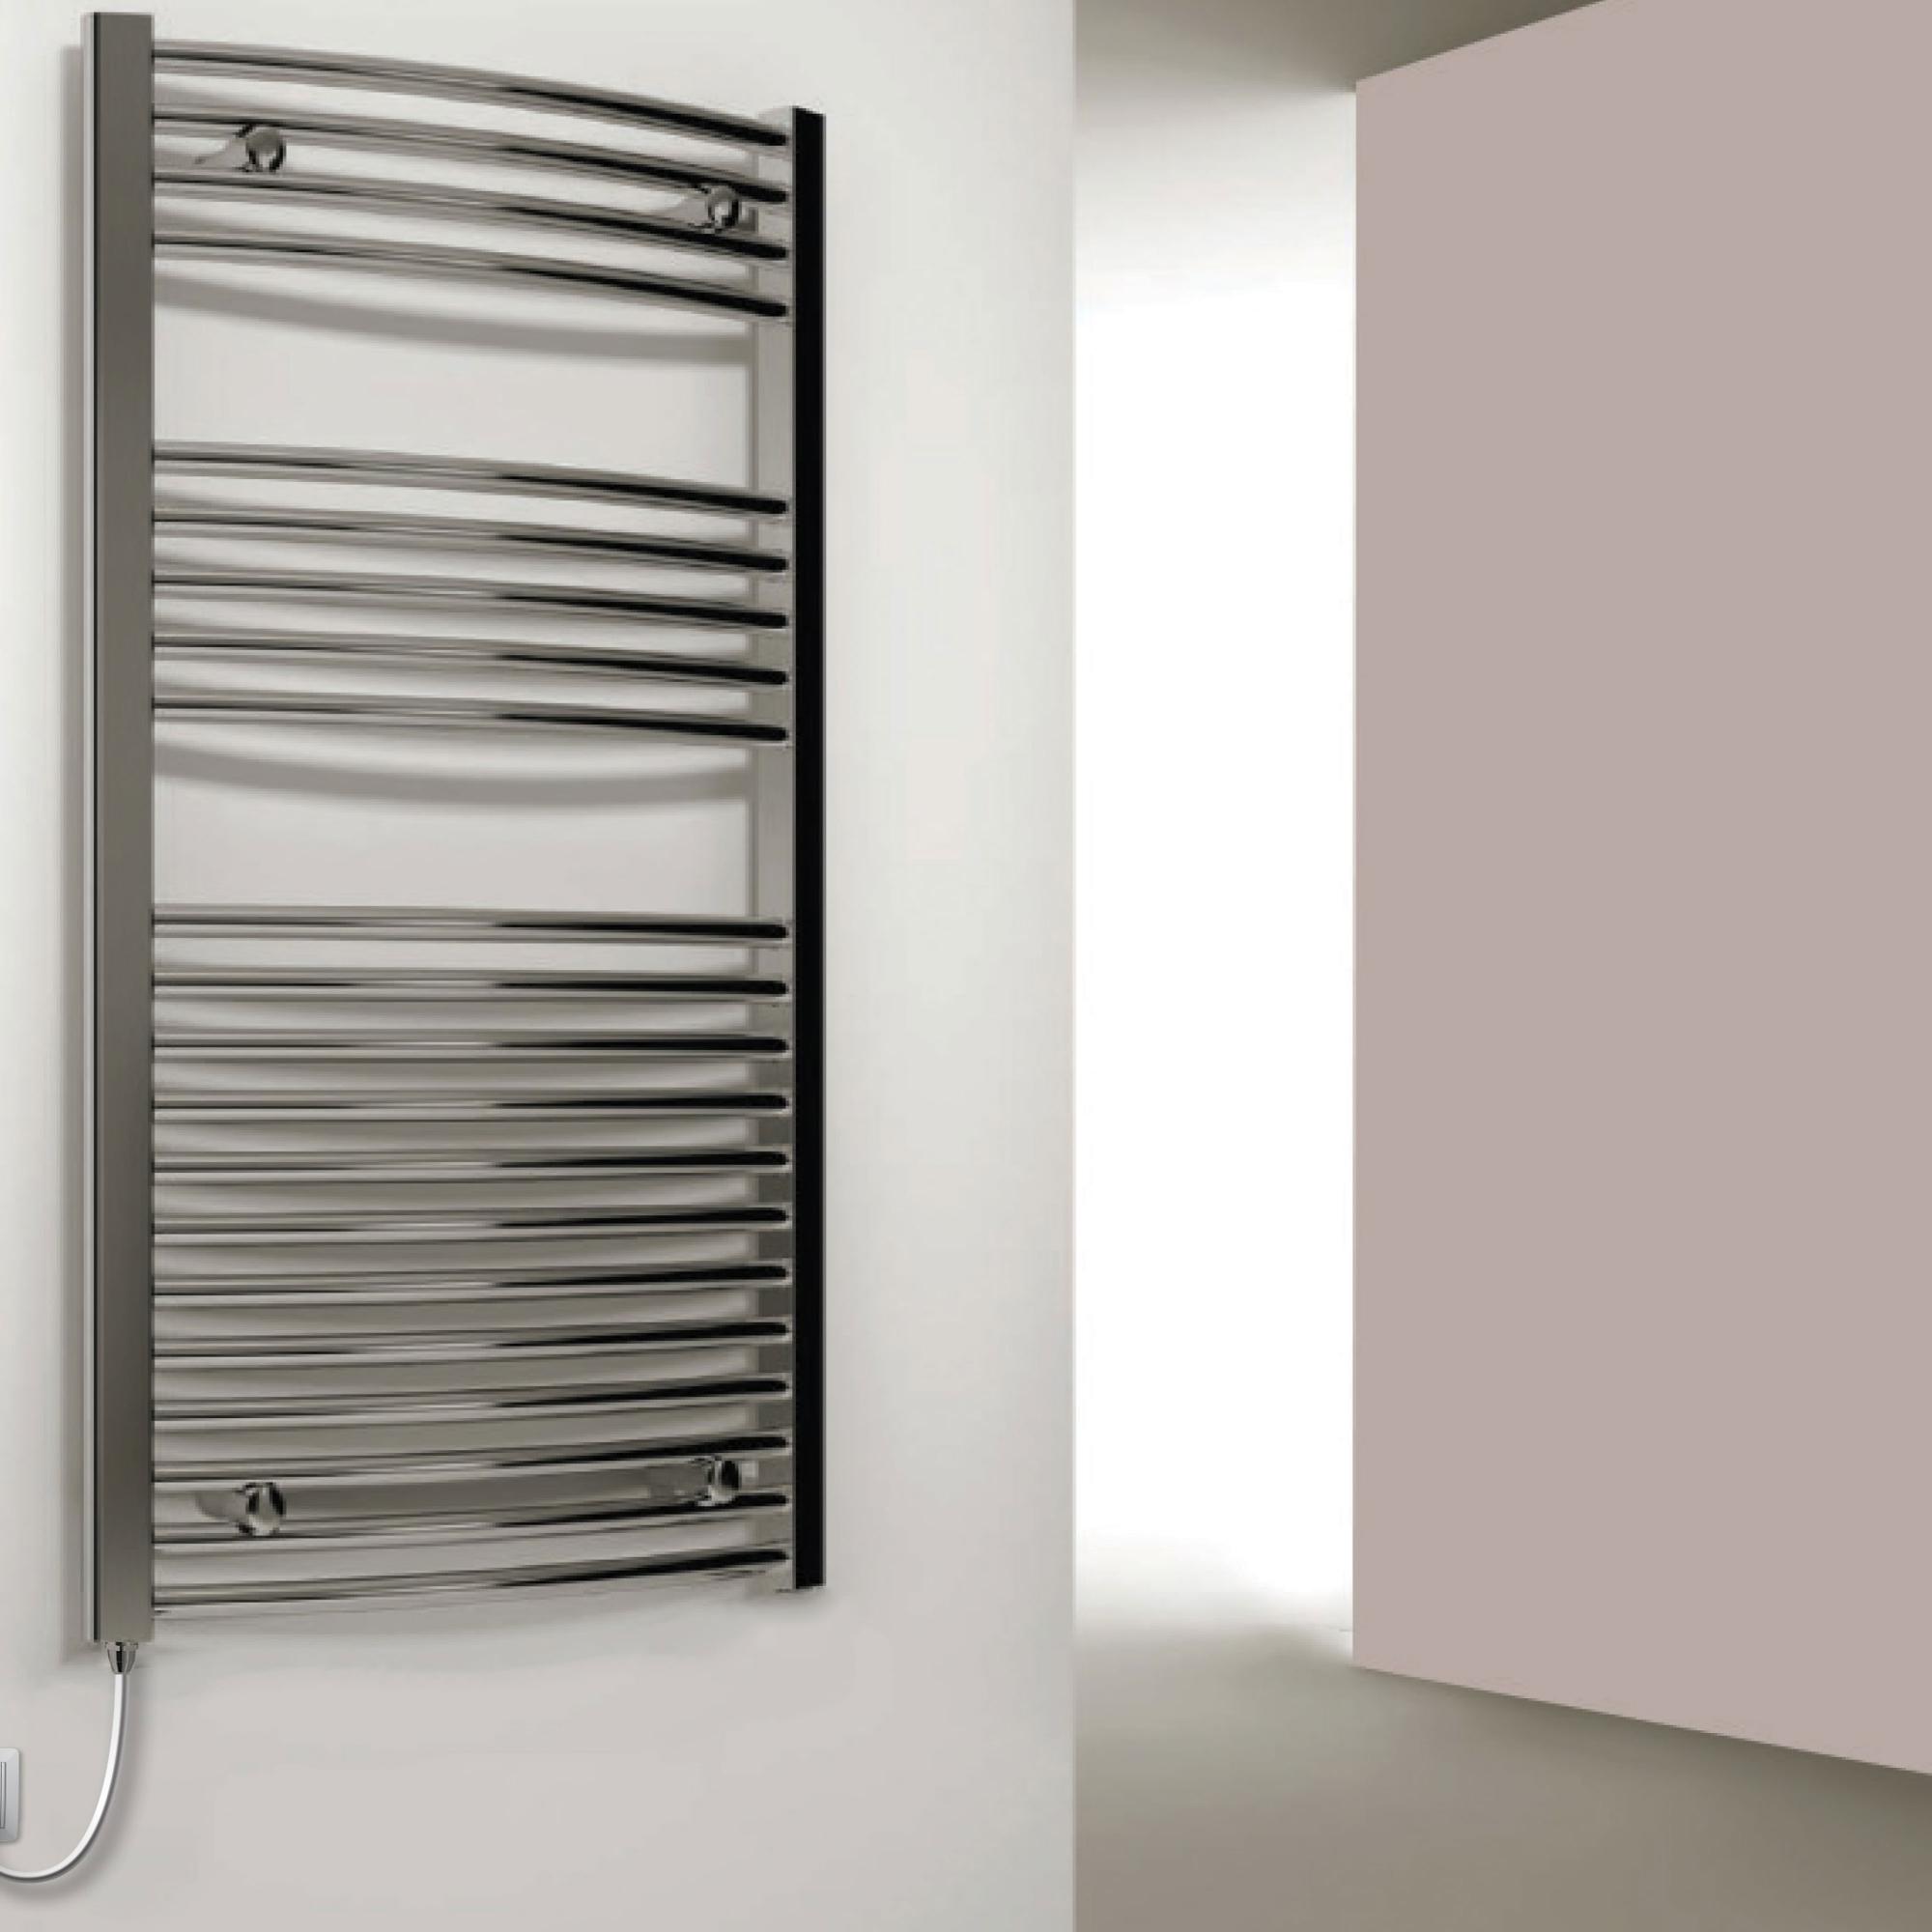 Reina Capo Curved Electric Heated Towel Rail 1200mm H x 600mm W Chrome-0